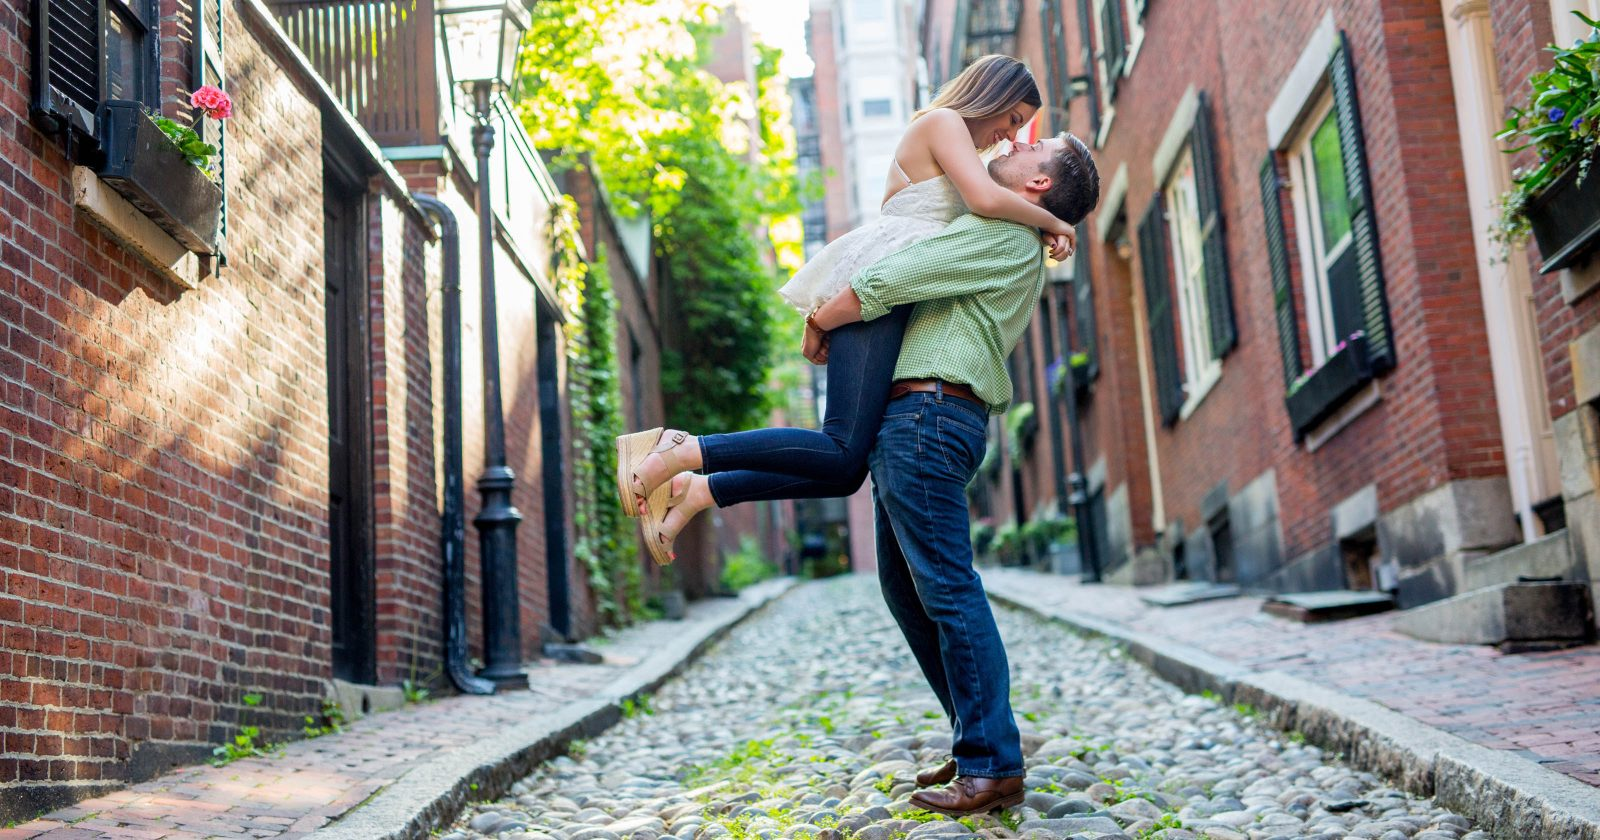 Engagement Photos in the Boston Public Garden